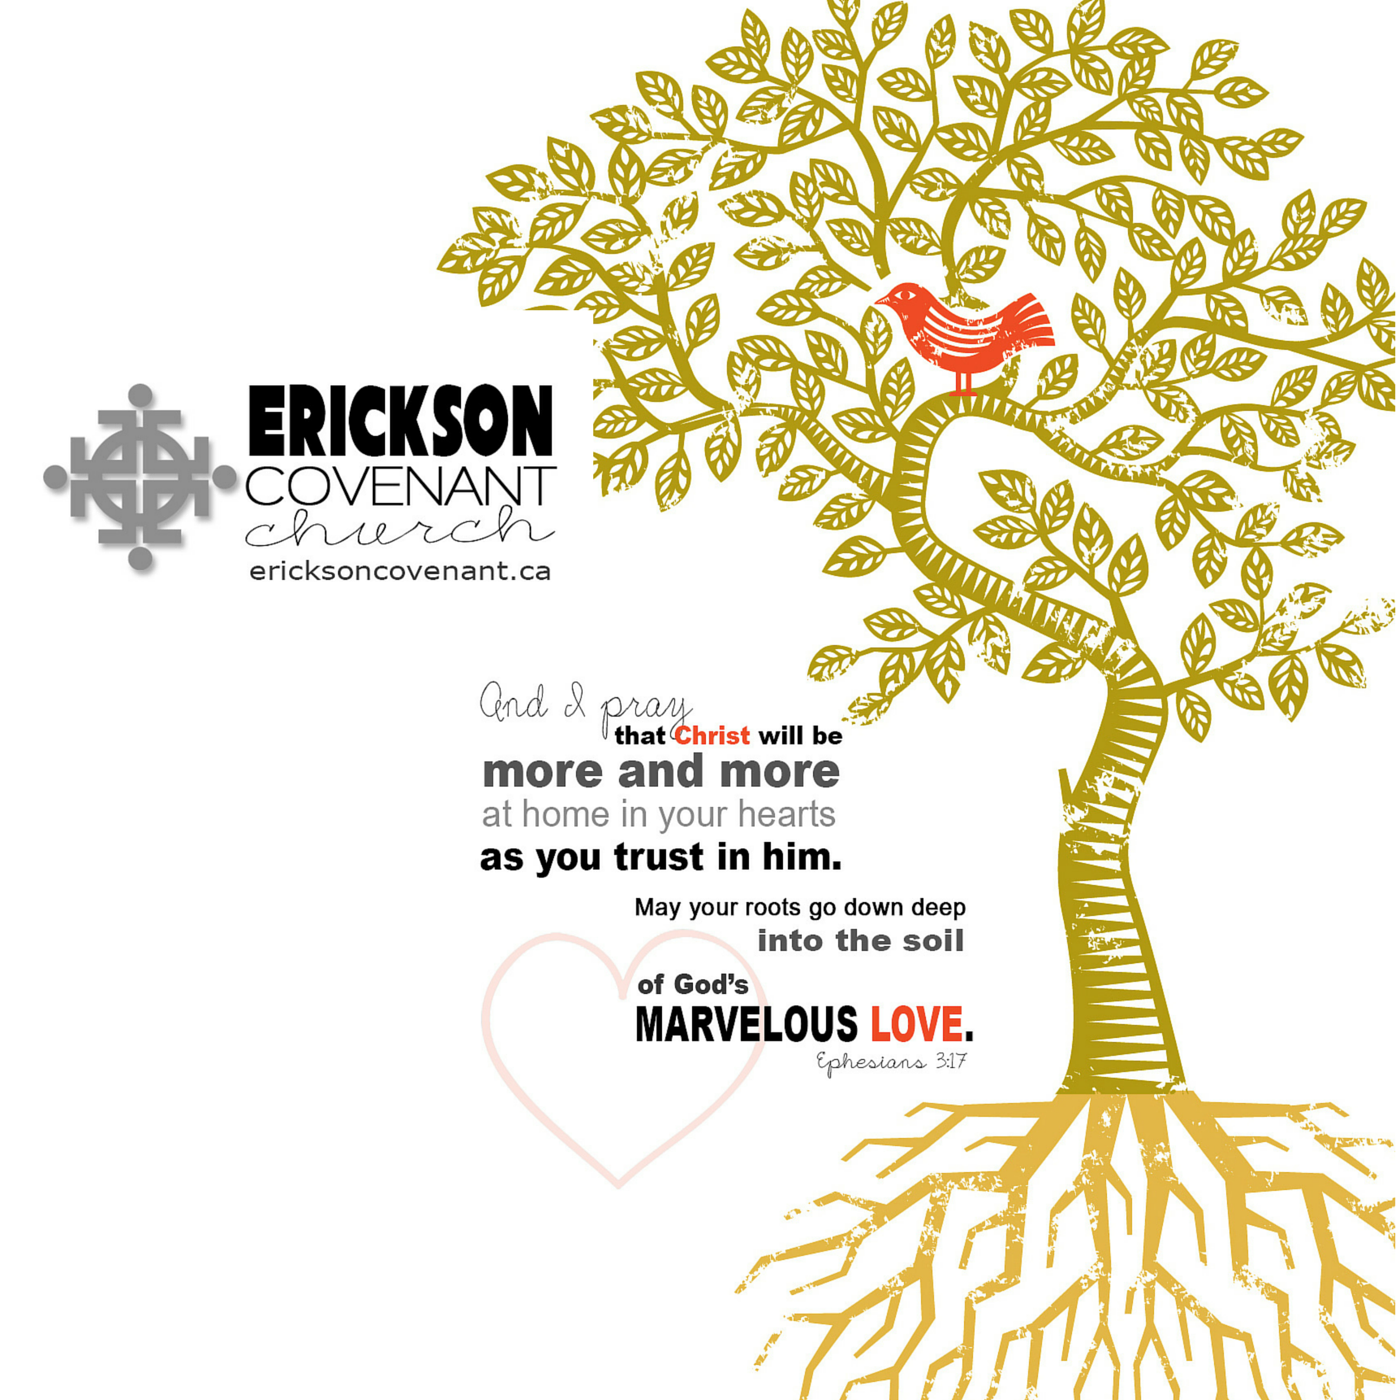 Erickson Covenant Church - Creston BC